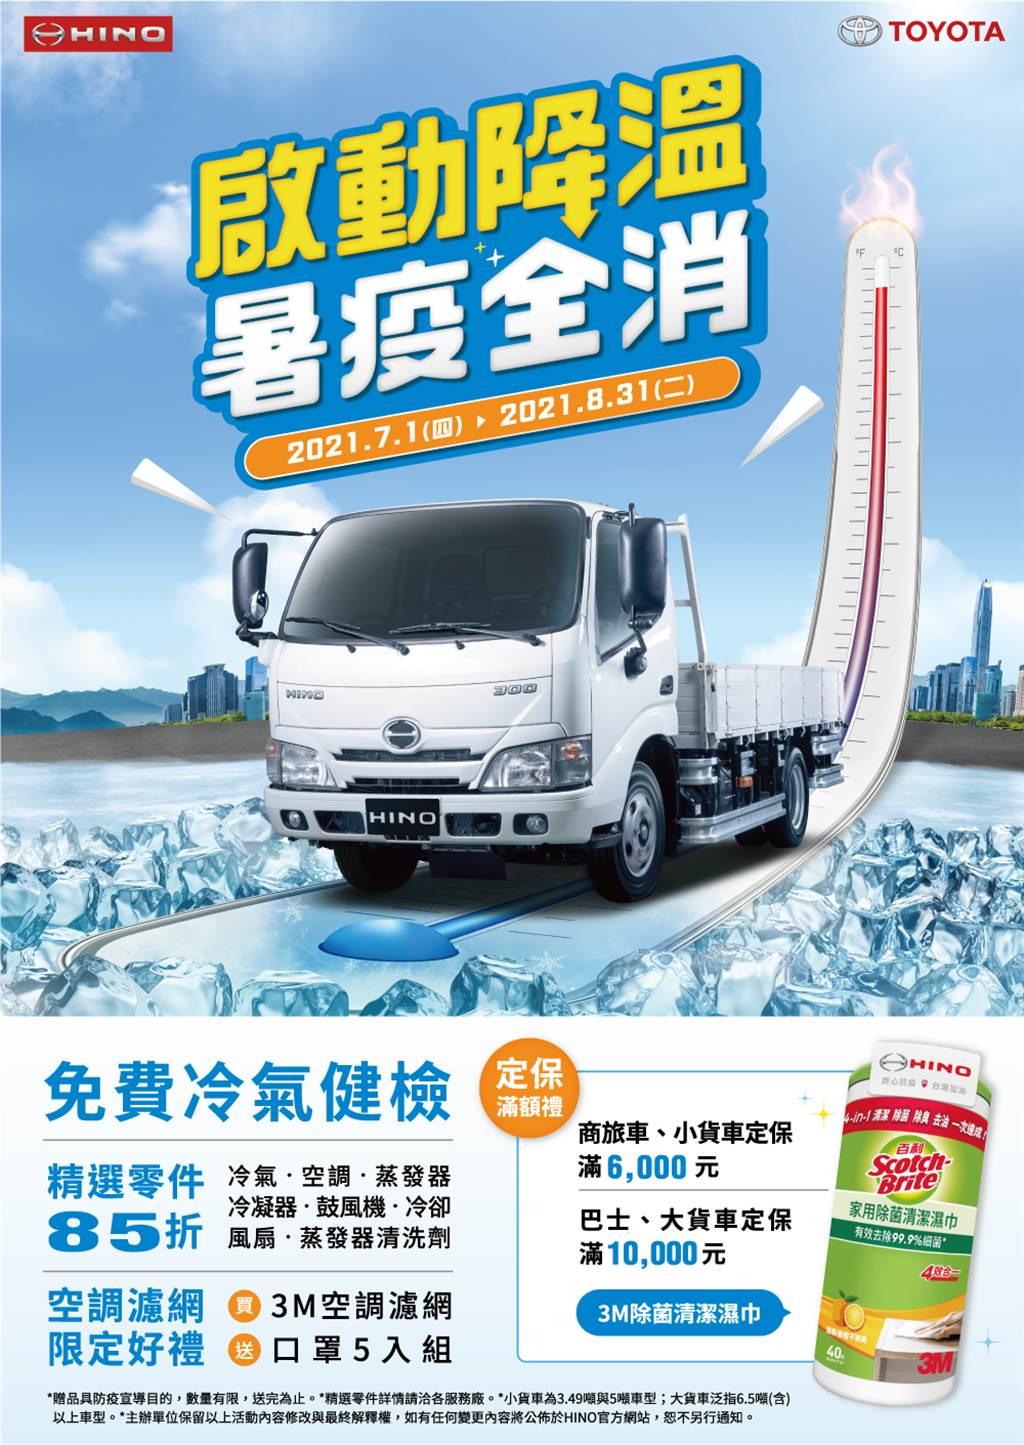 HINO舉辦 「啟動降溫,暑疫全消」回廠活動。